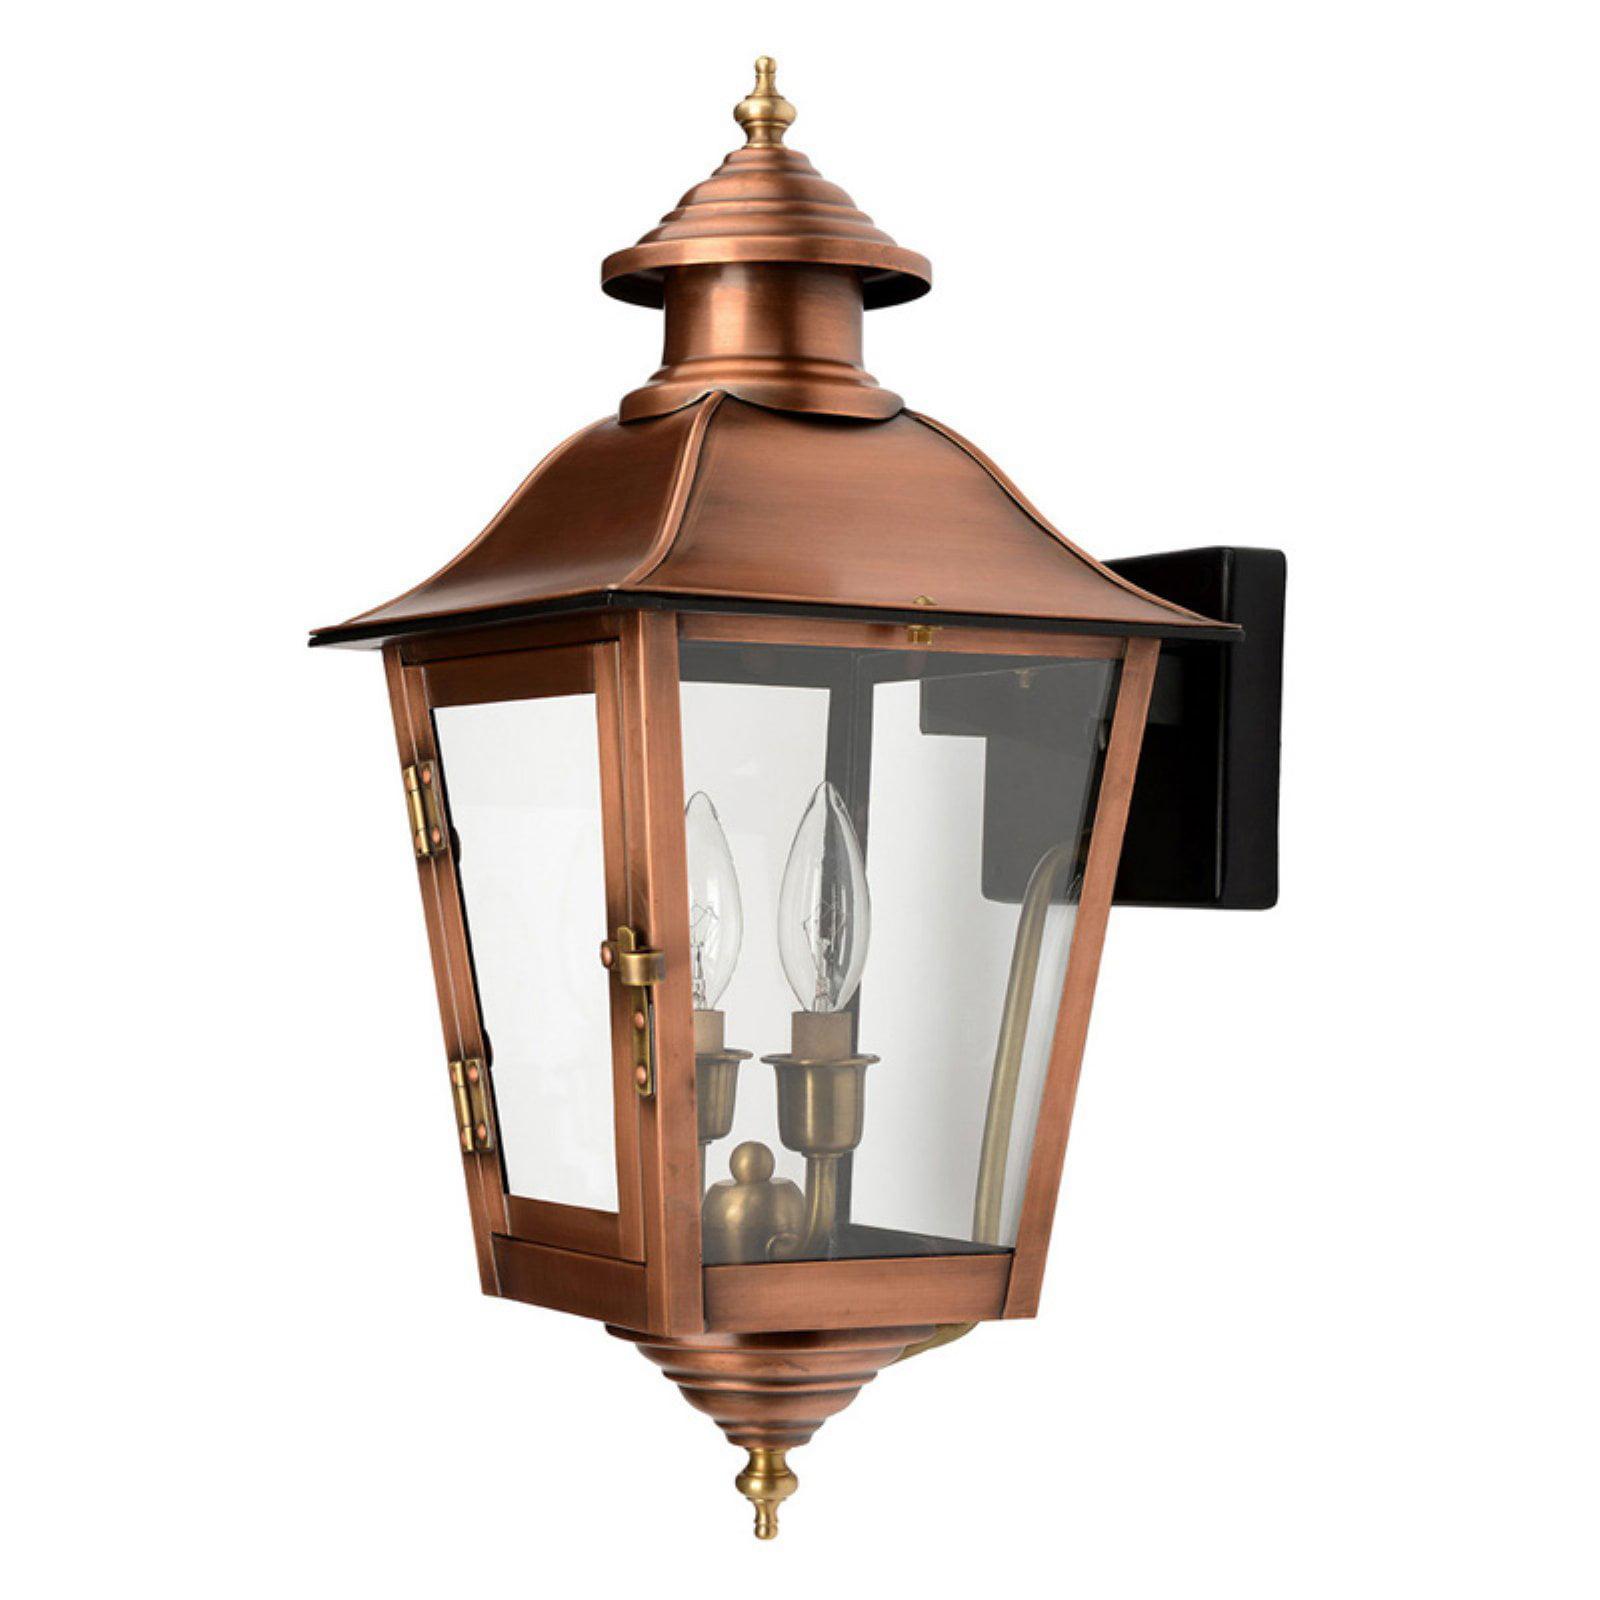 Acclaim Lighting Natchez Outdoor Wall Mount Light Fixture